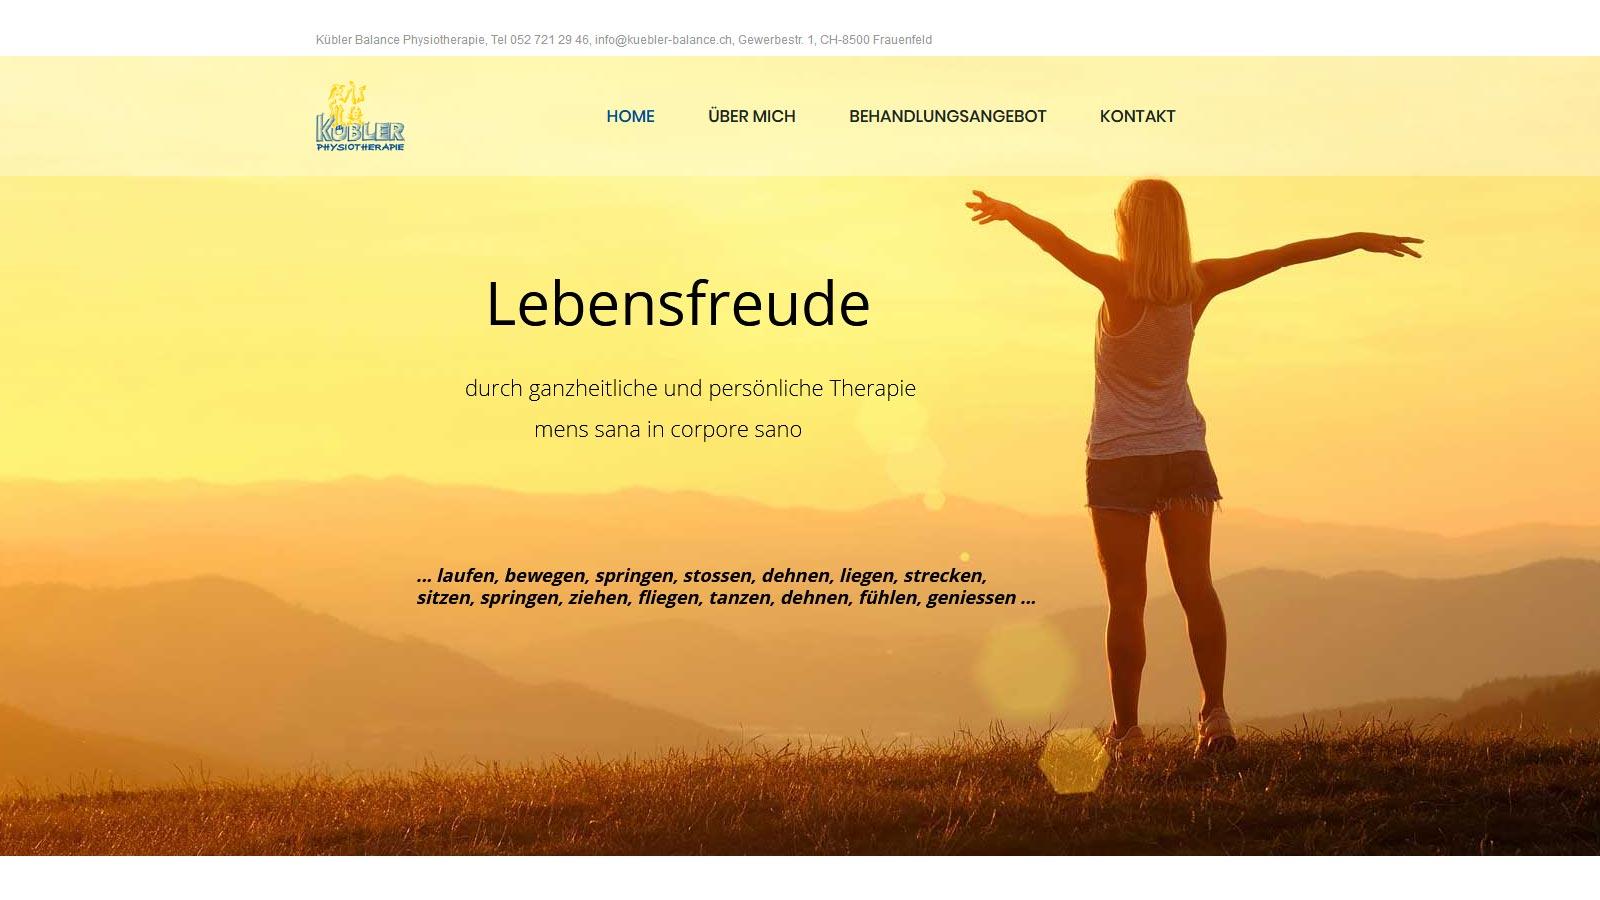 kuebler-balance.ch